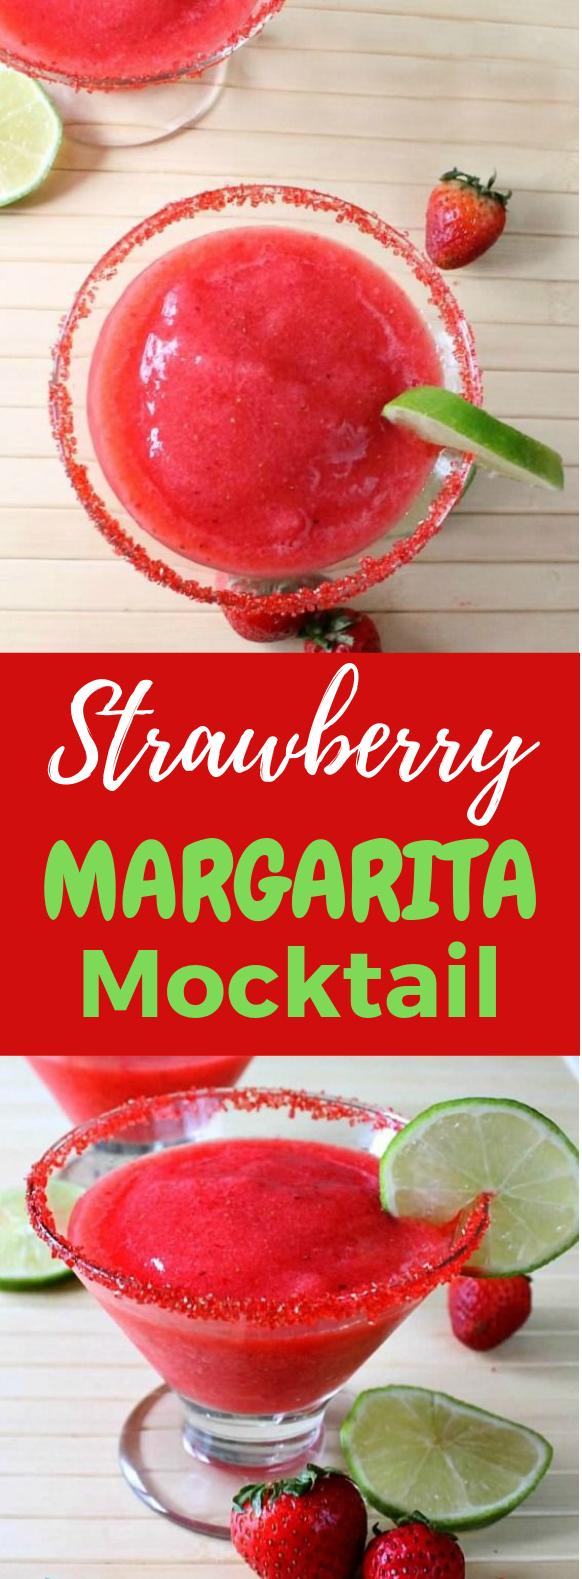 STRAWBERRY MARGARITA MOCKTAIL #Mocktail #Drink